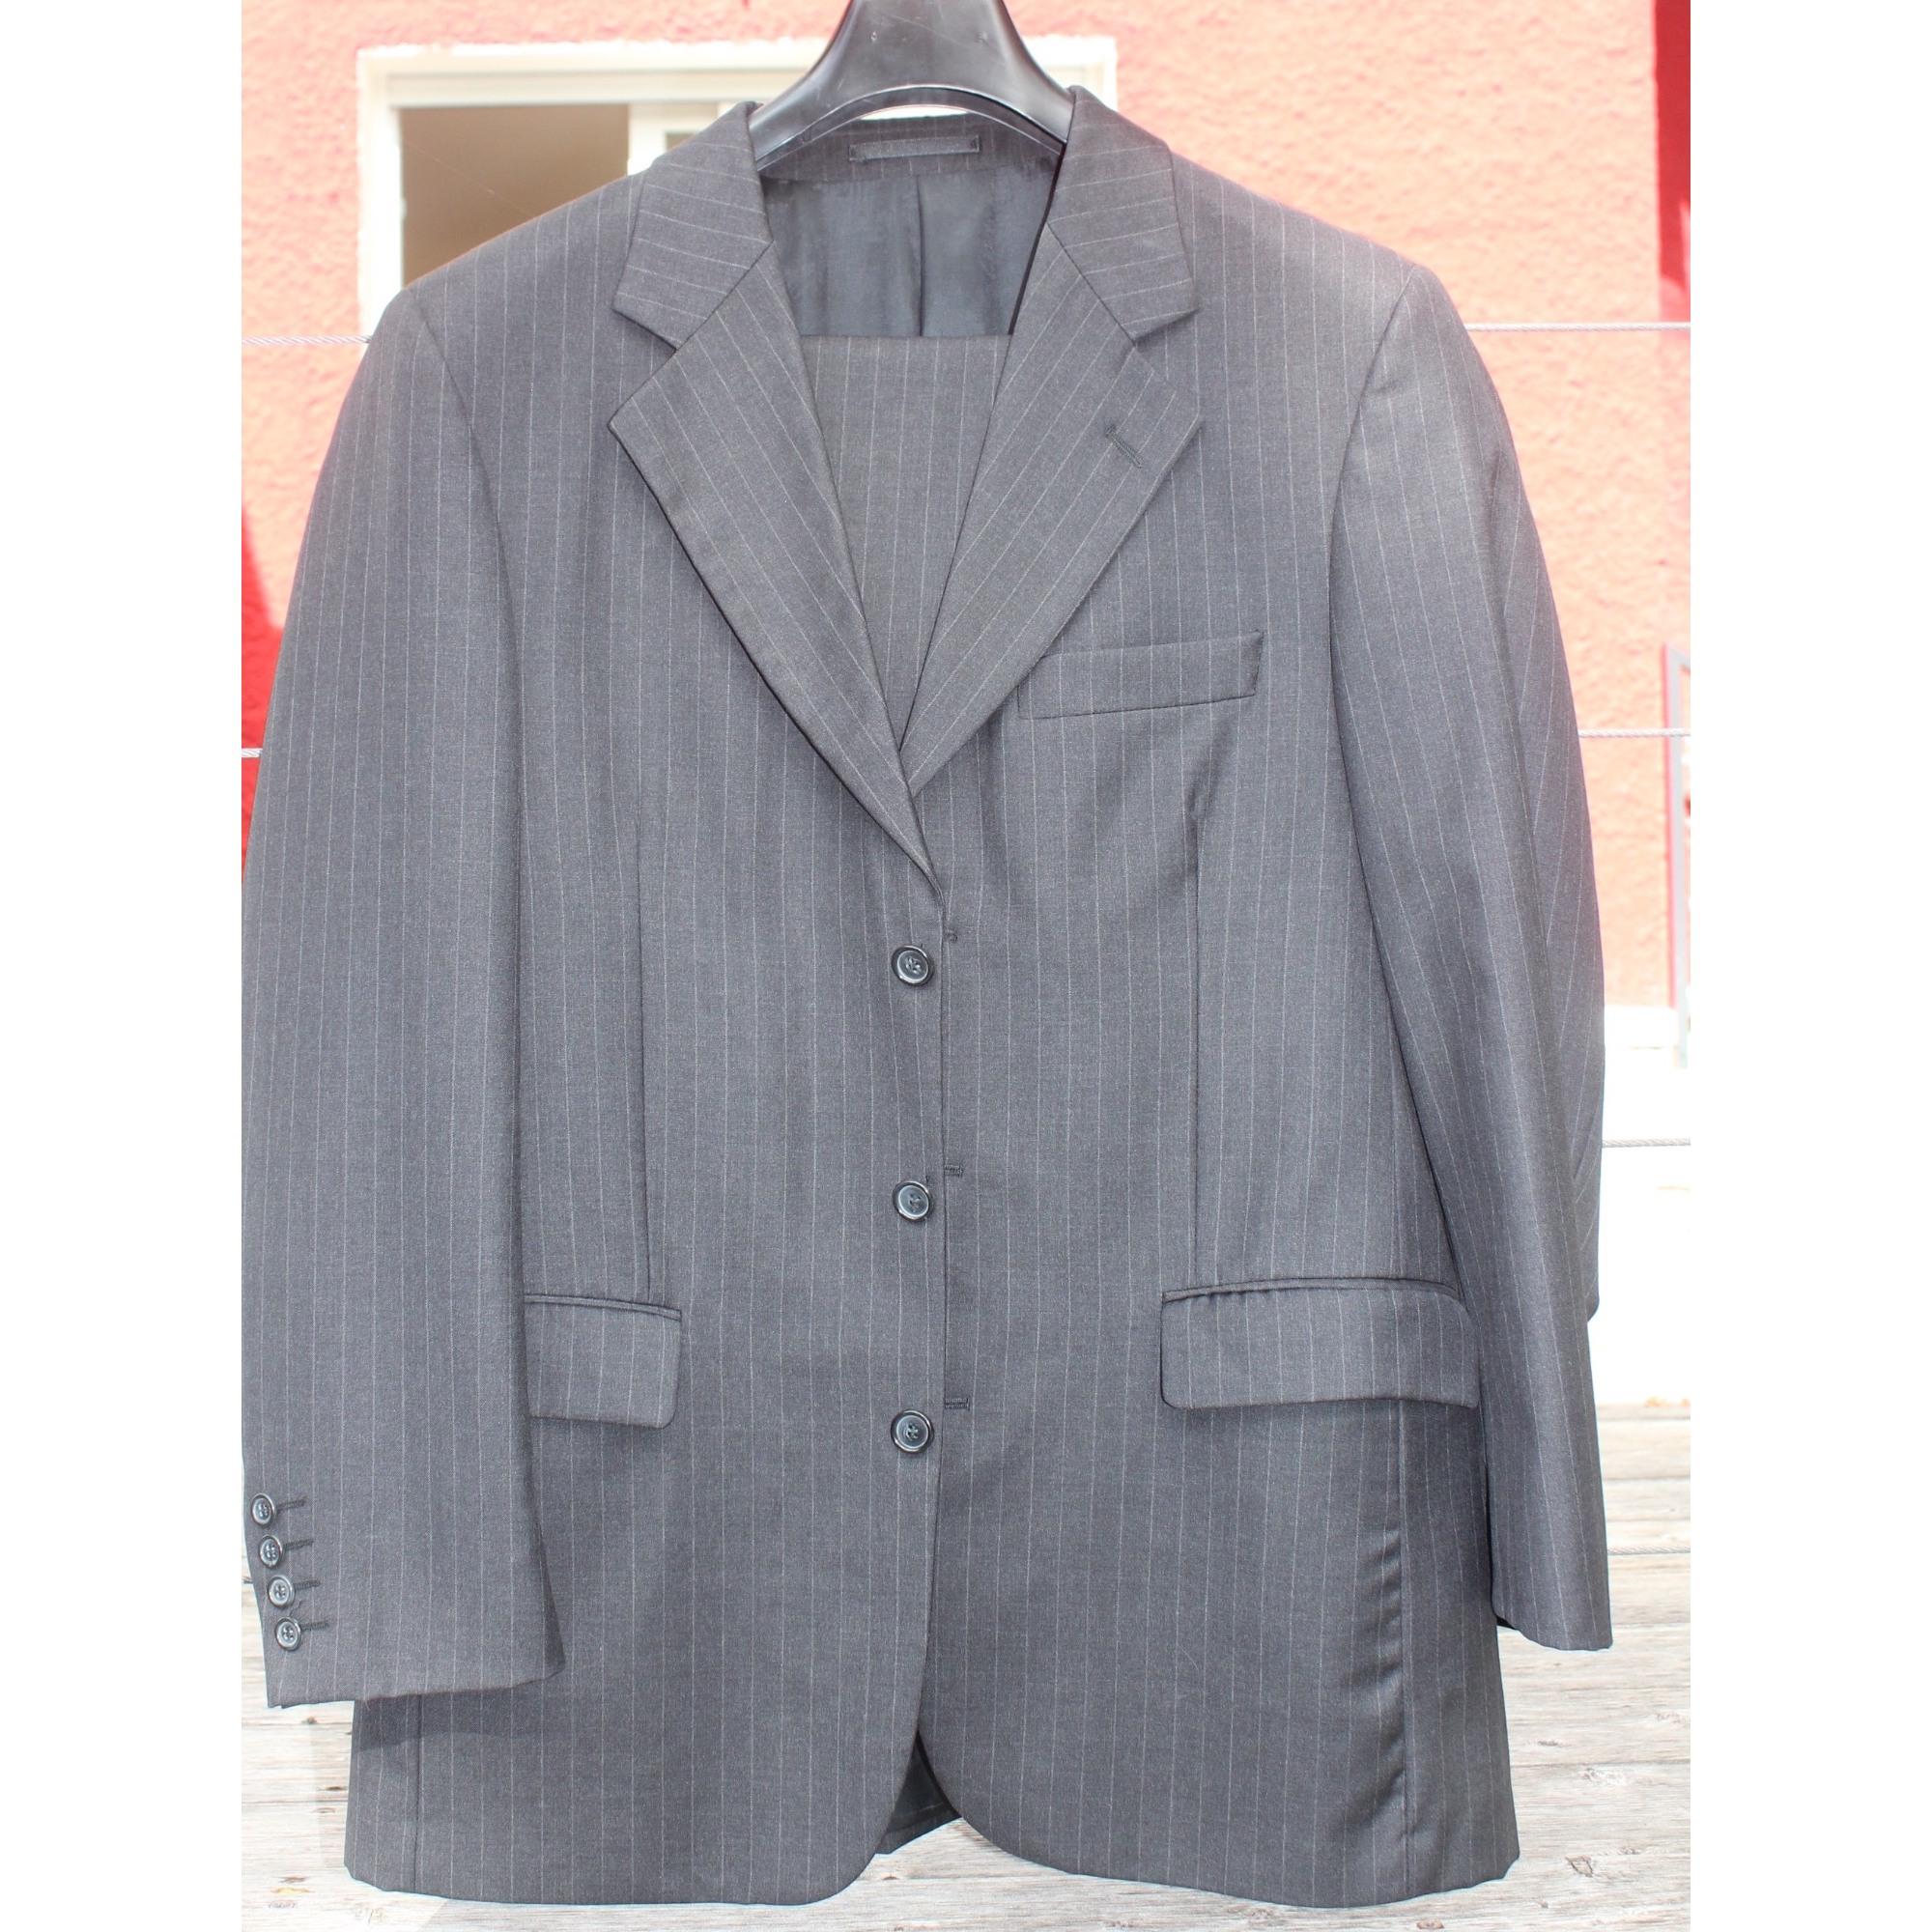 Costume complet BURTON Gris, anthracite